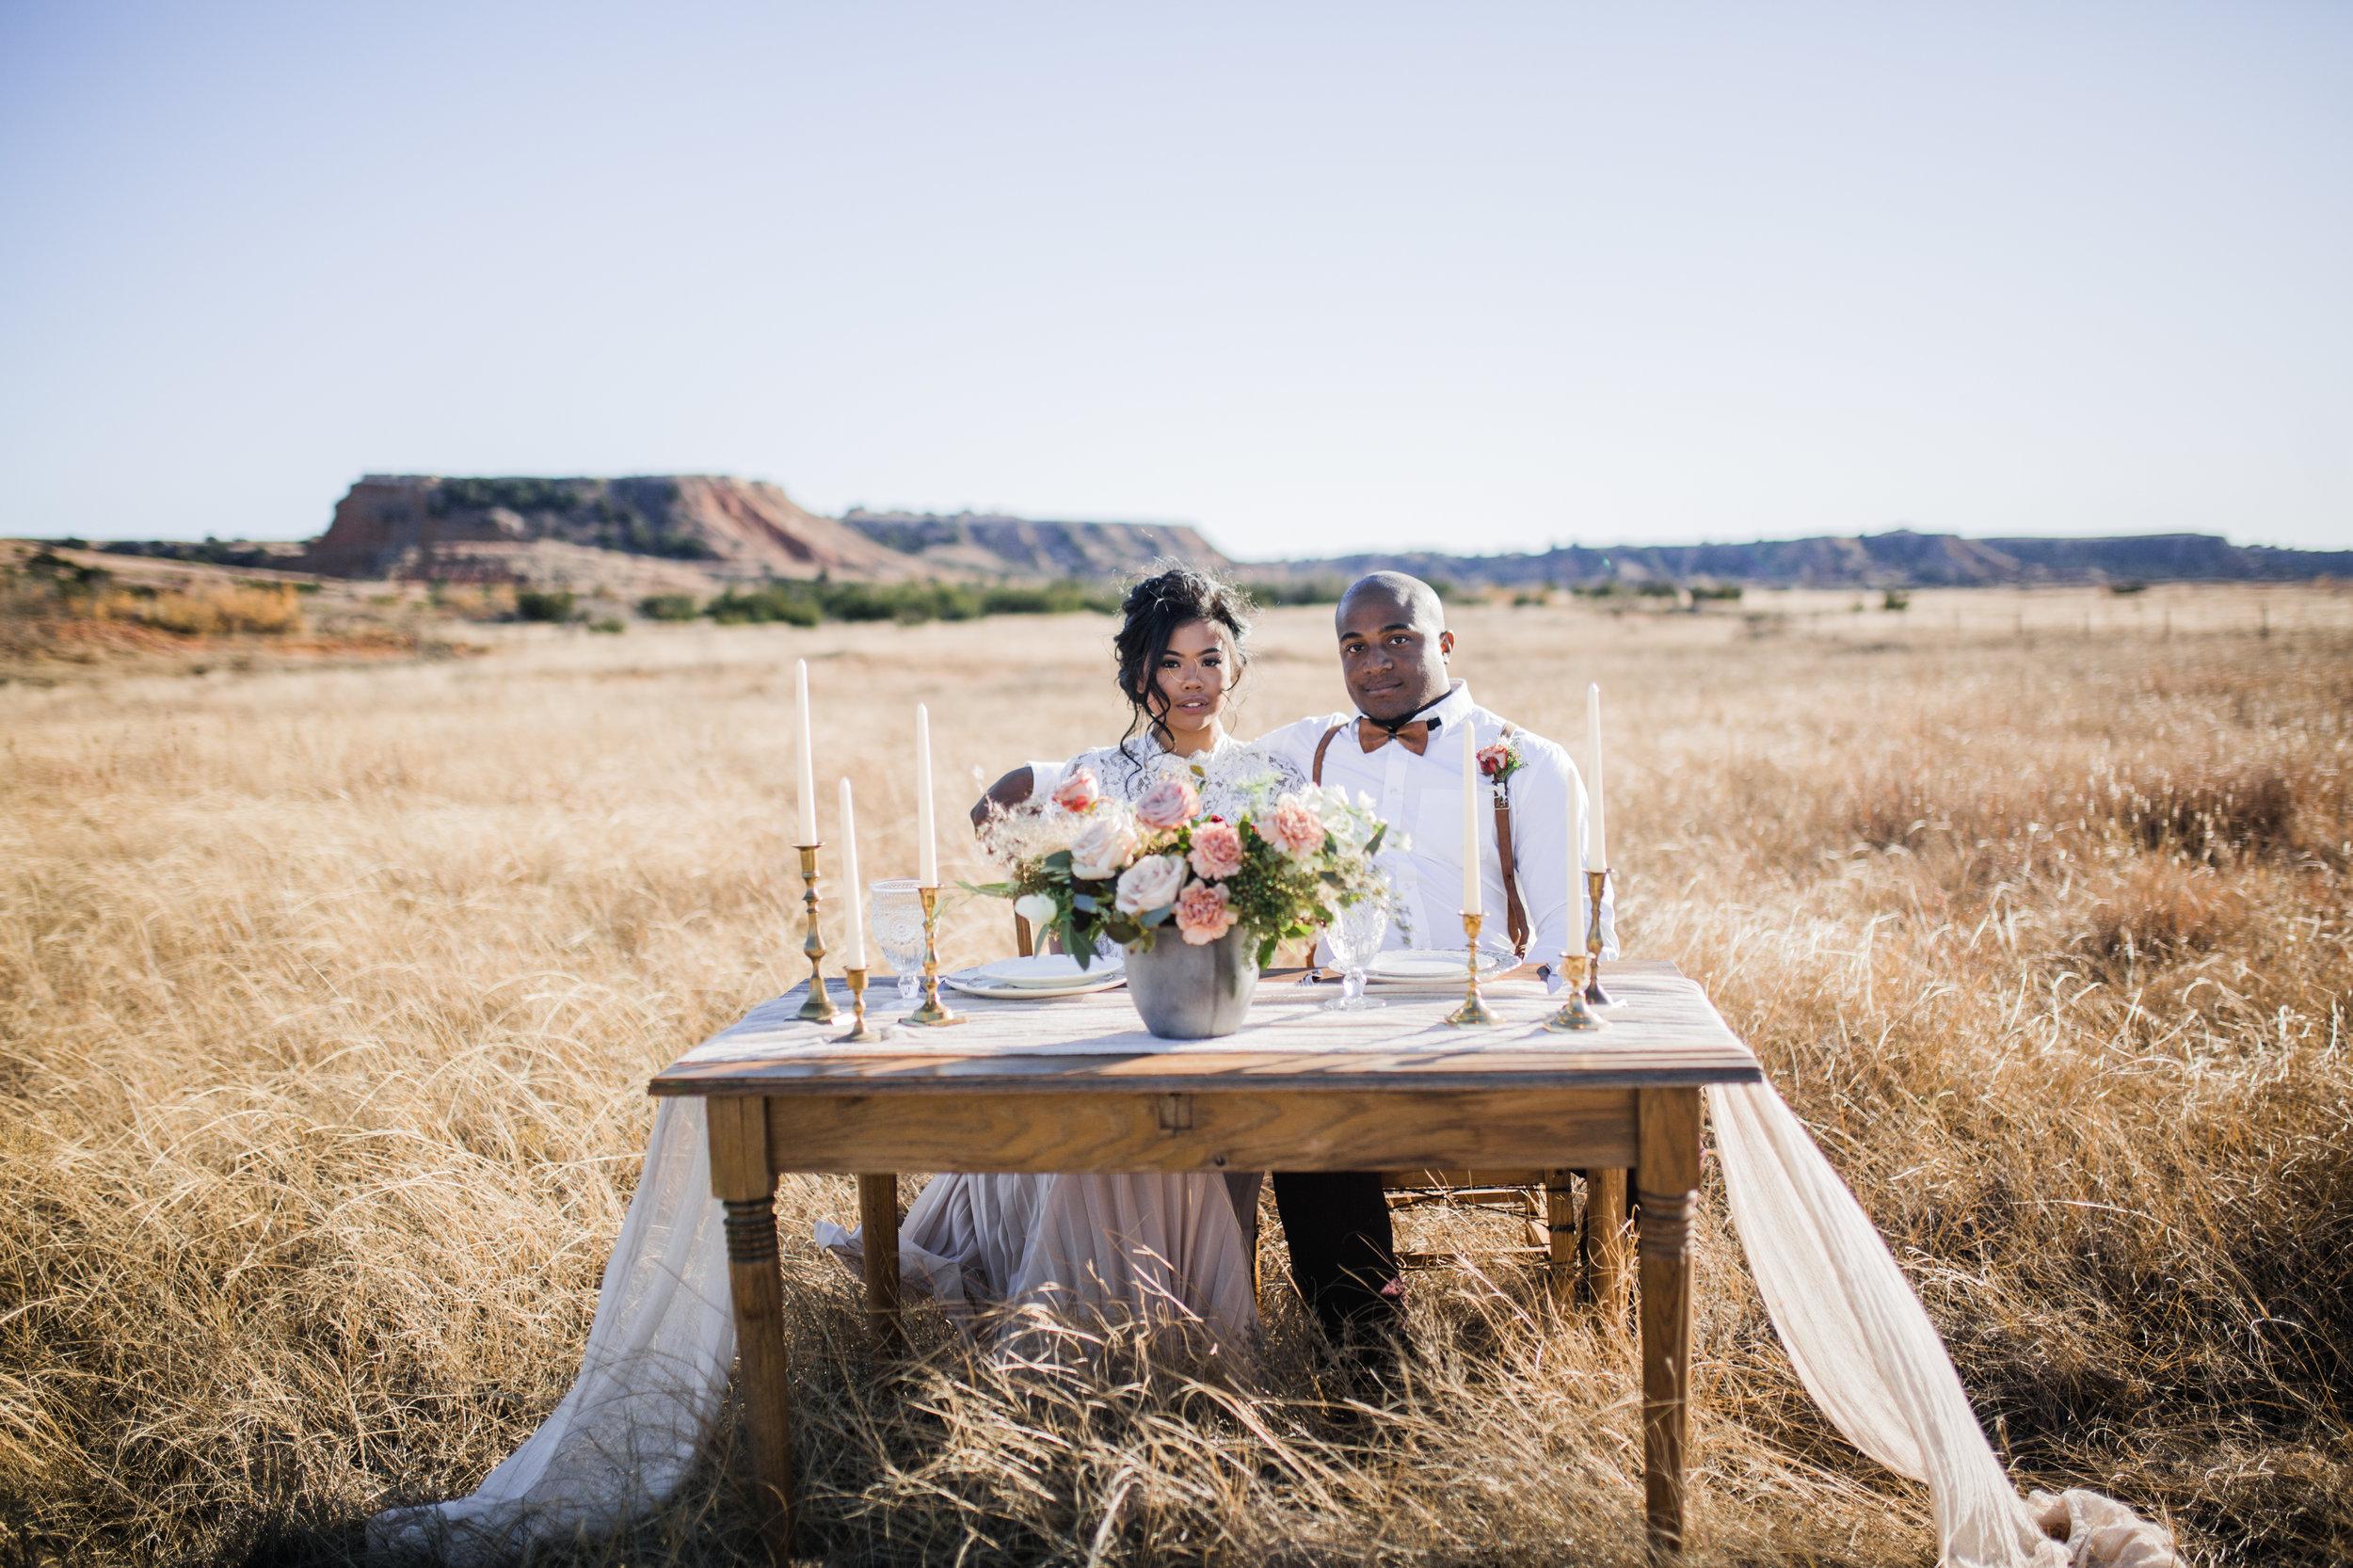 gloss-mountain-wedding-la-vintage-ok-rentals-06.jpg